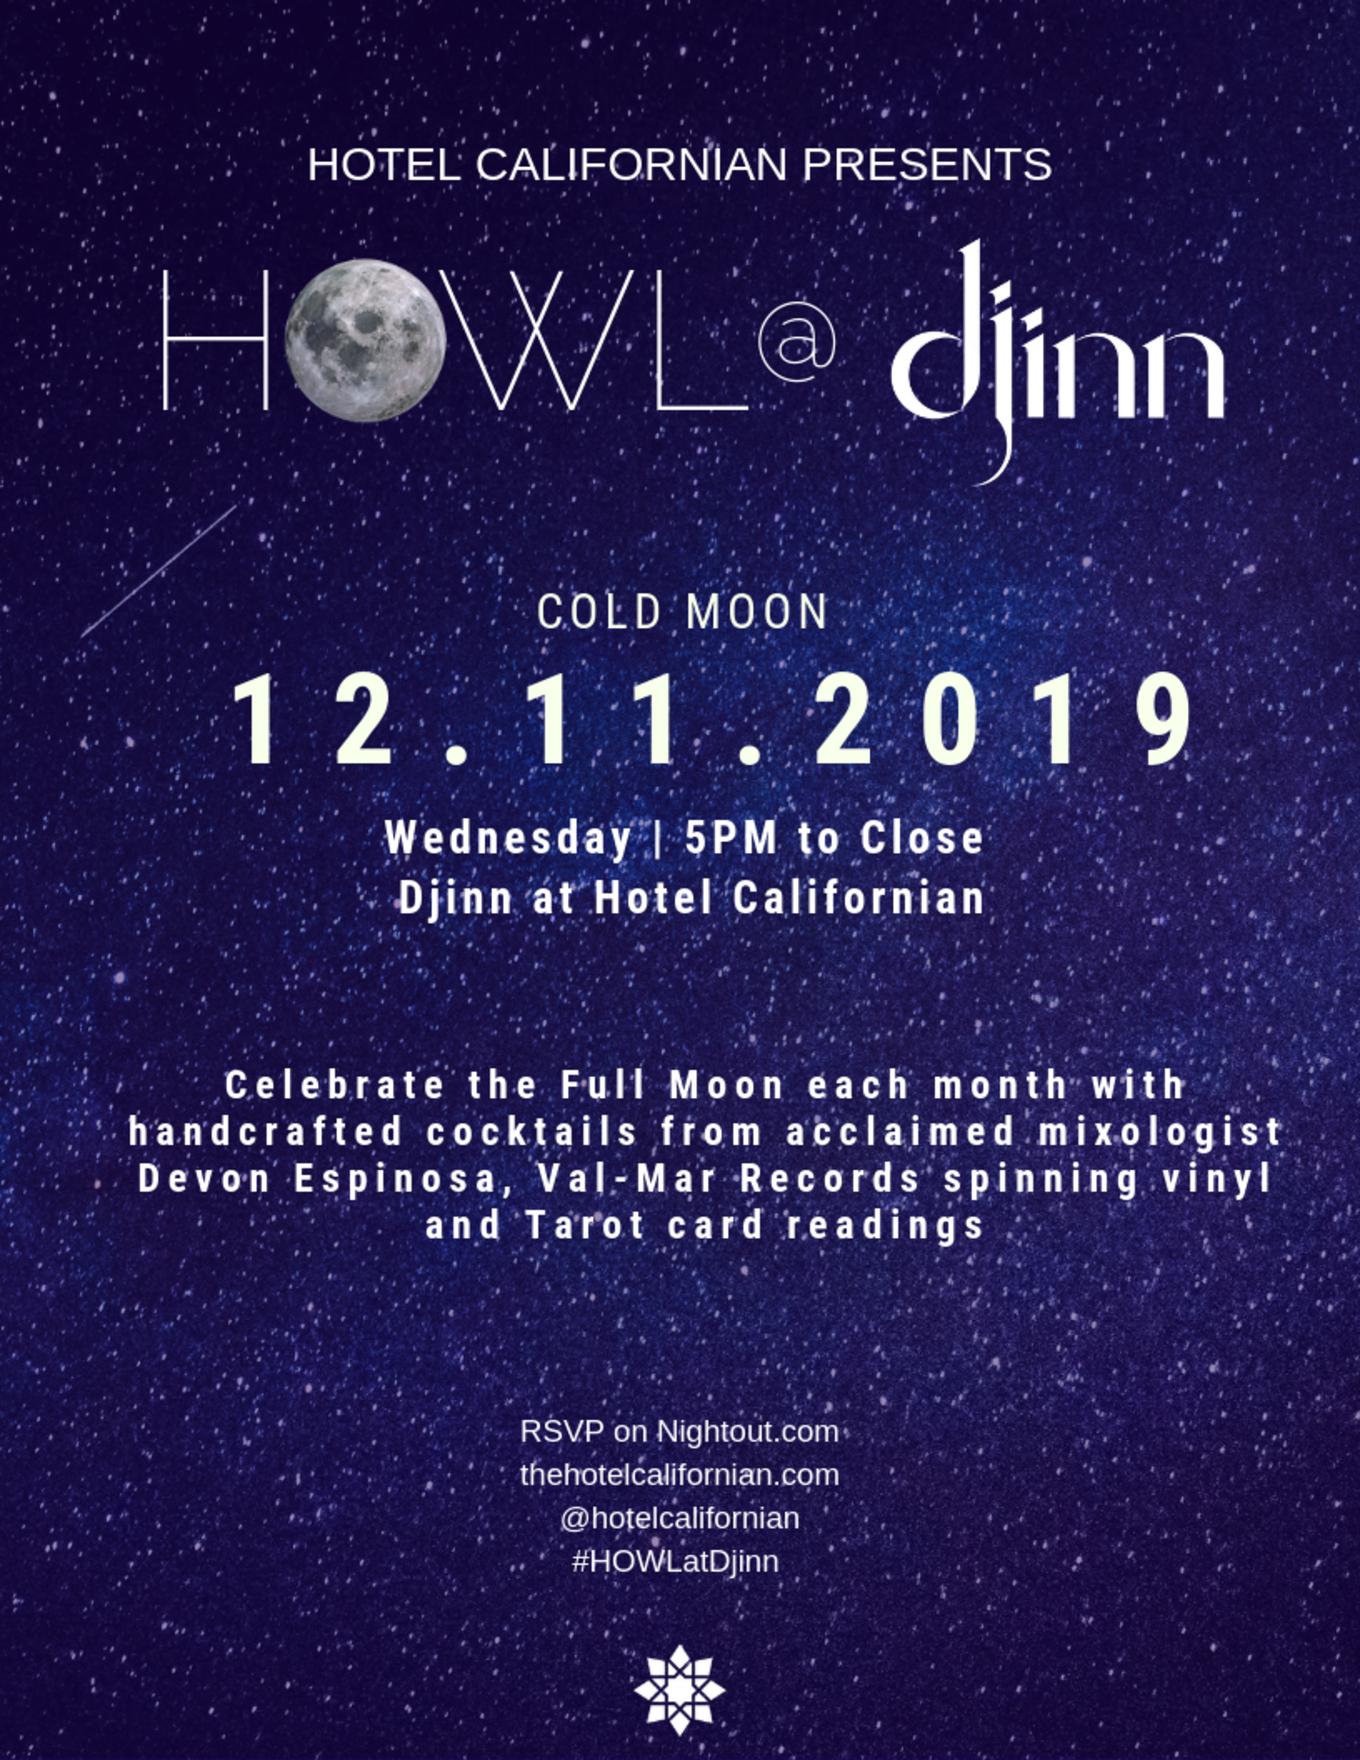 Hotel Californian Presents HOWL @ Djinn - Tickets - Djinn at Hotel